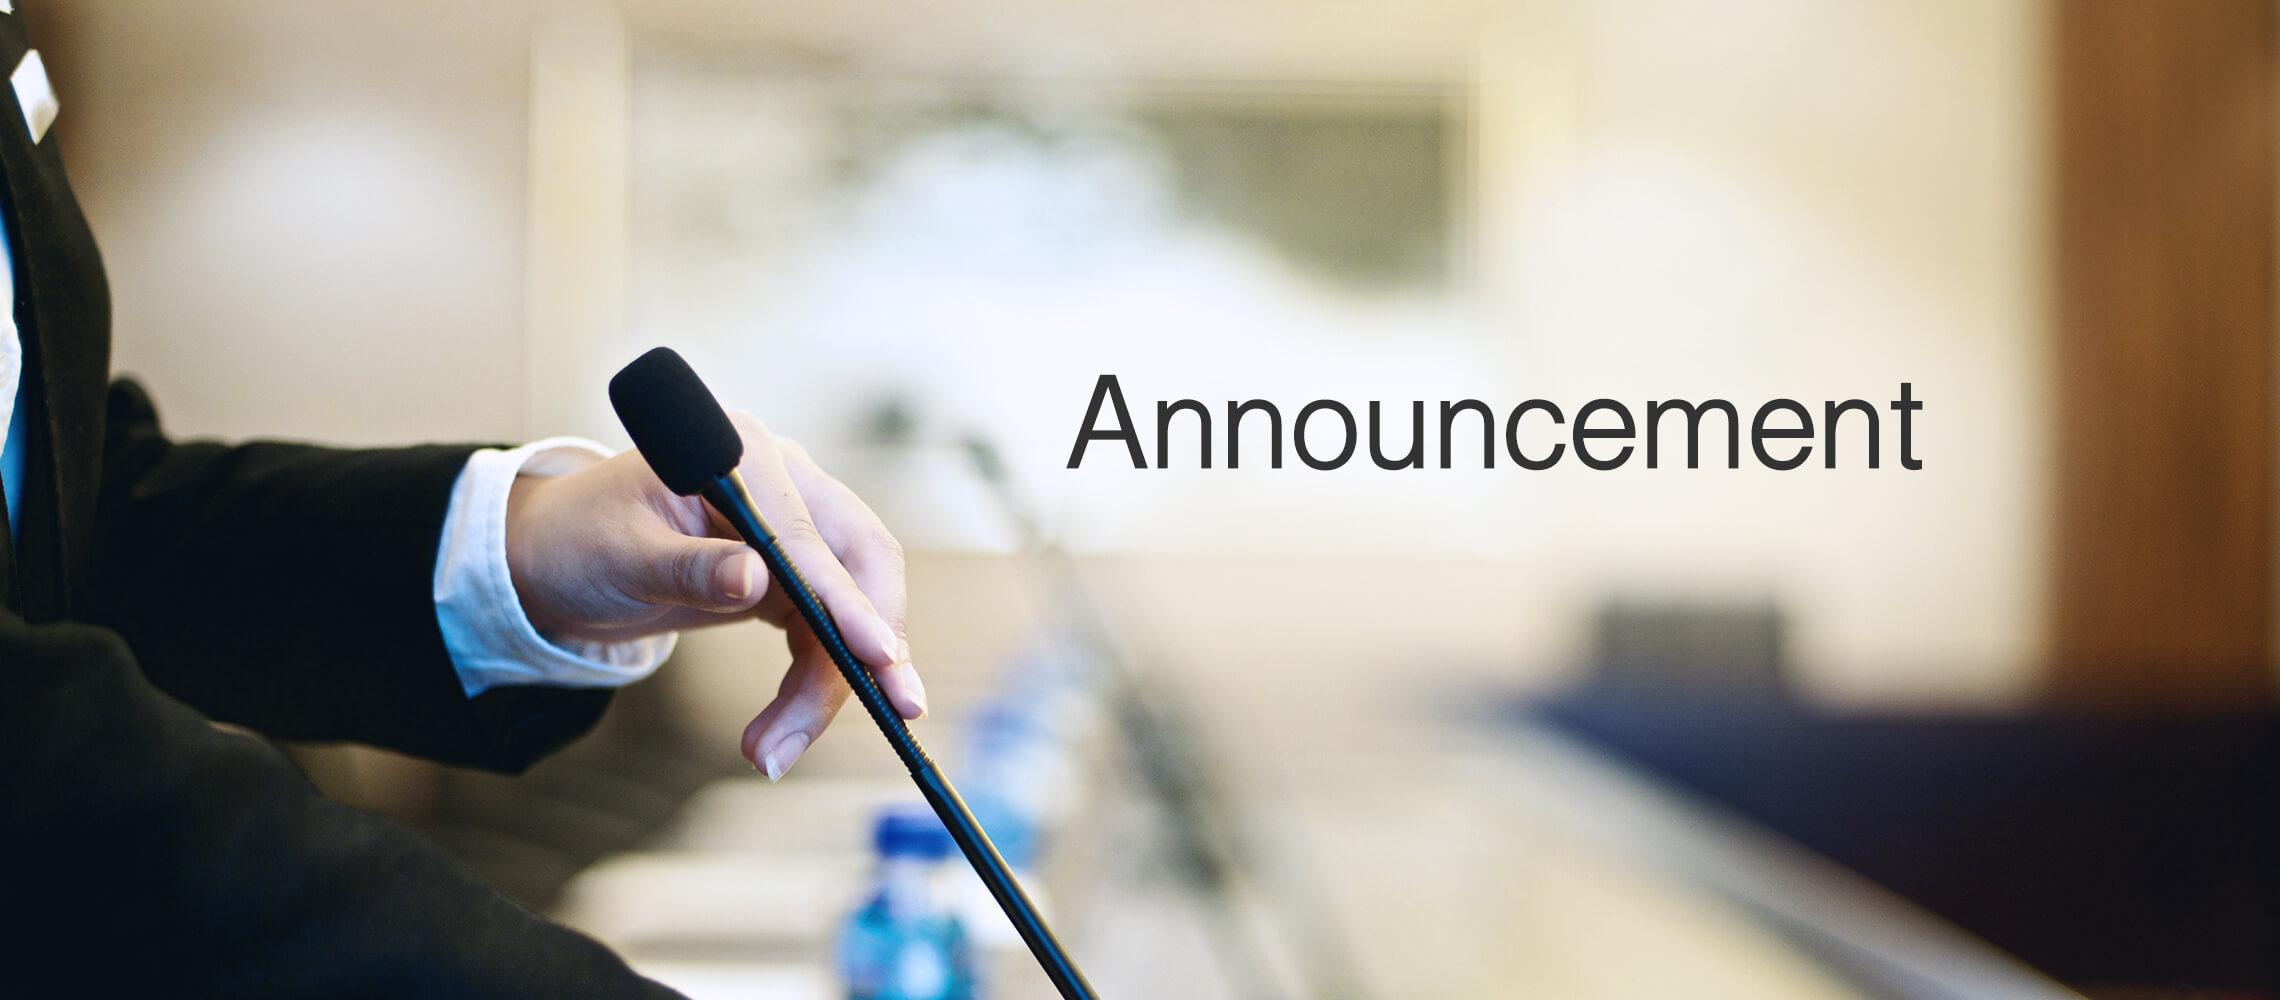 announcements kasikornbank